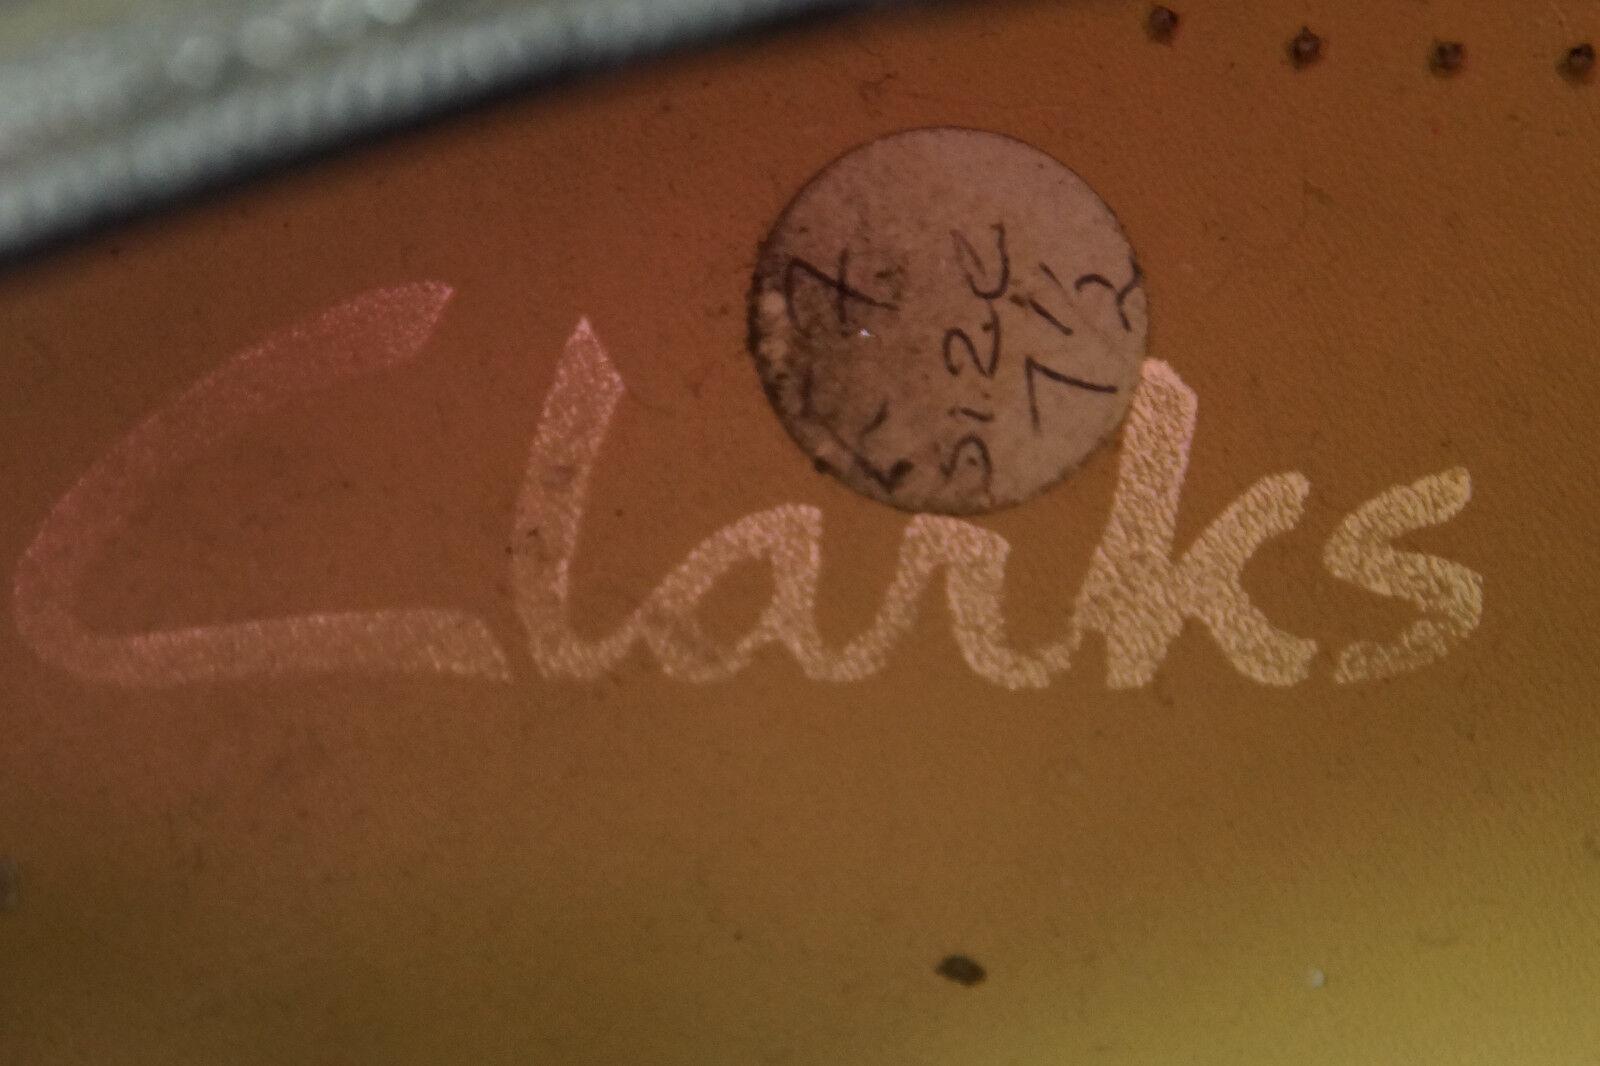 Clarks Uomo Tg